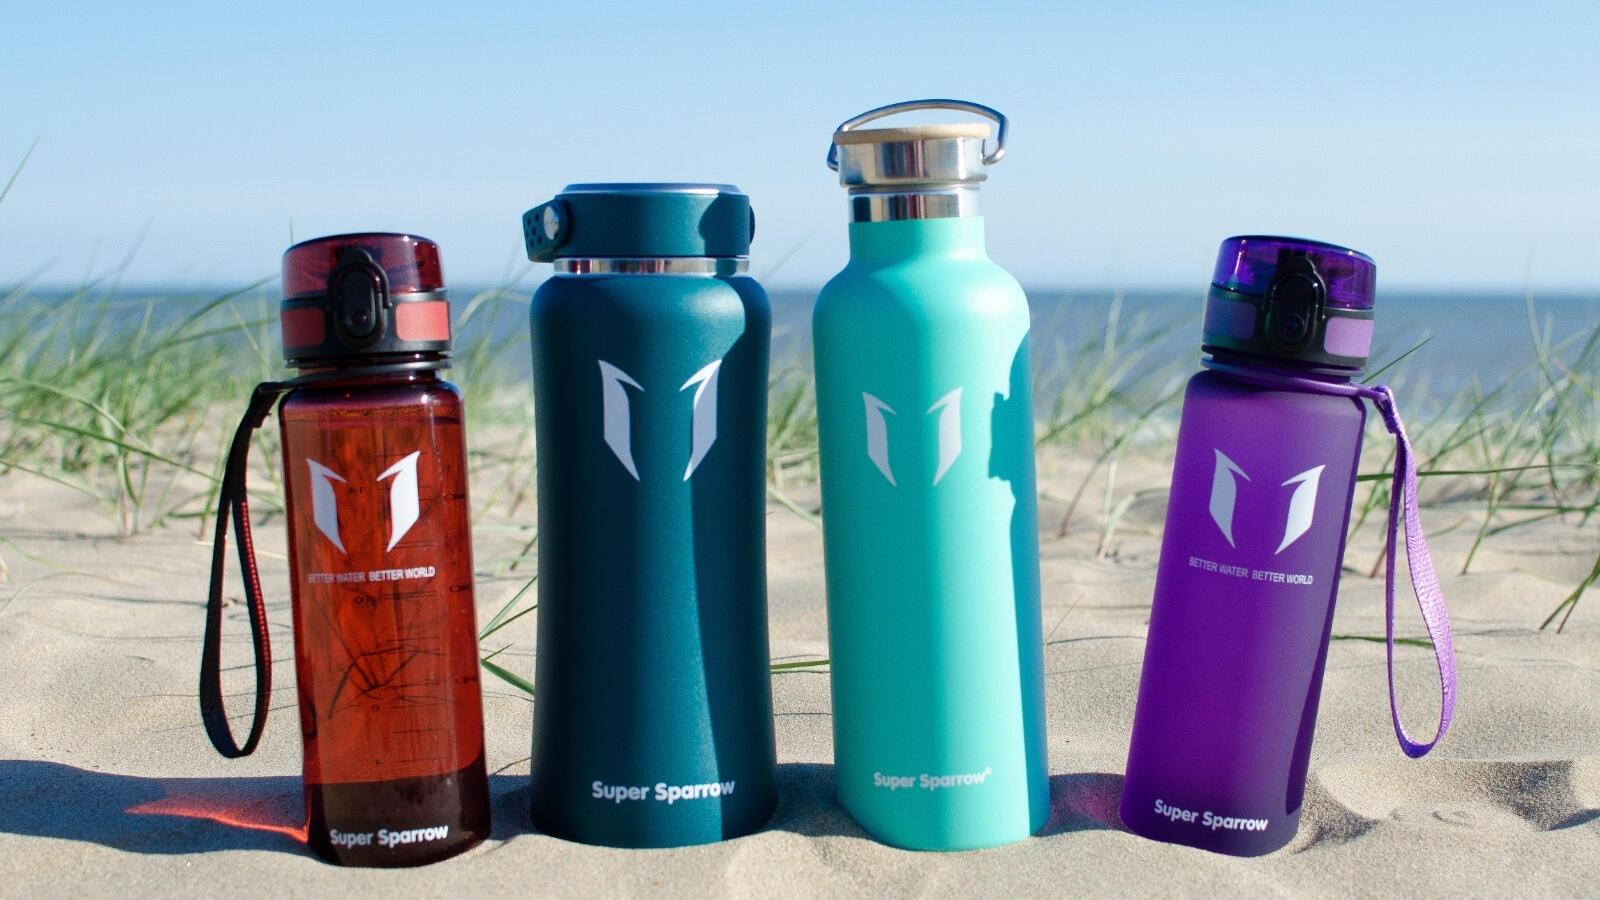 Water bottles Super Sparrow